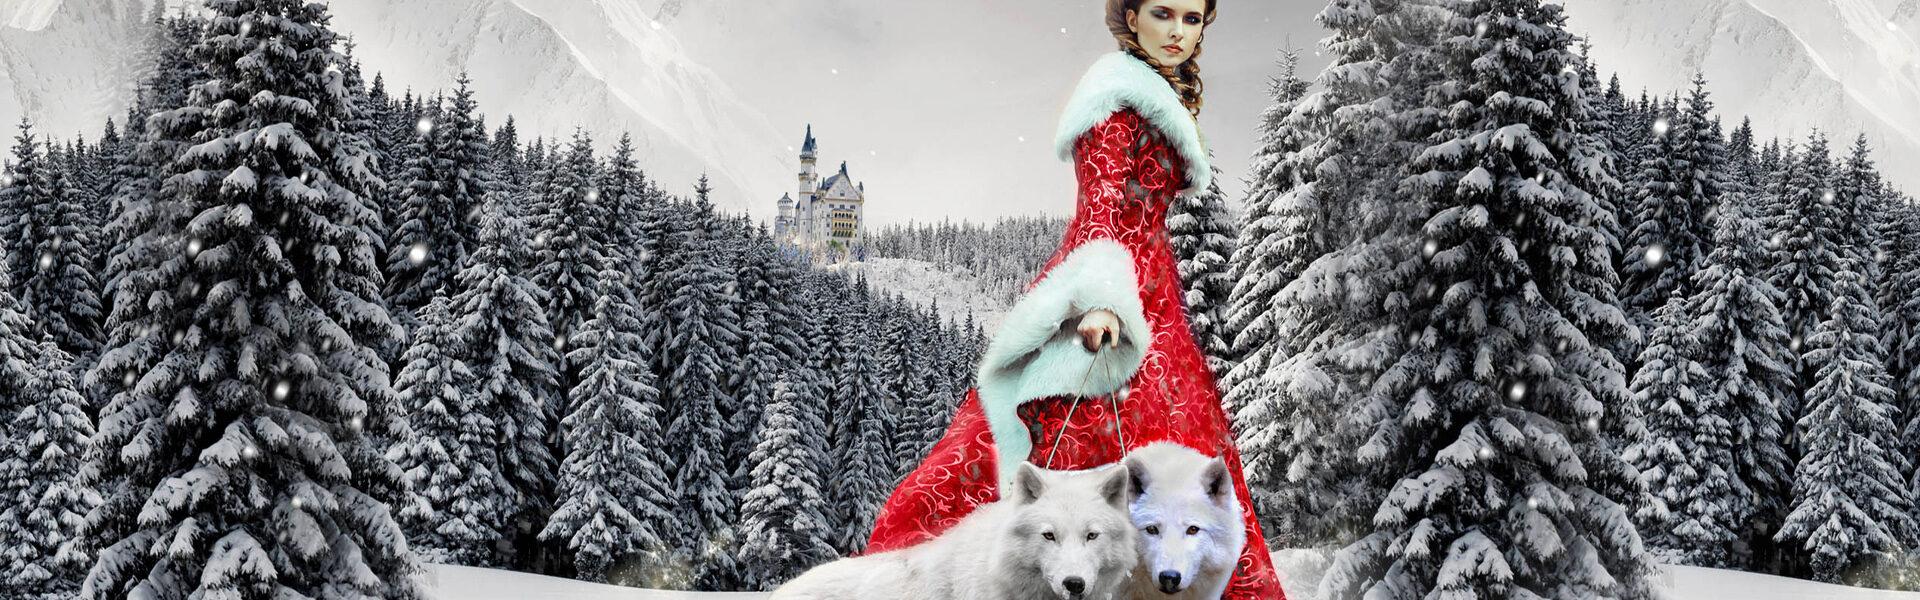 Bestselling Epic Fantasy Book Series